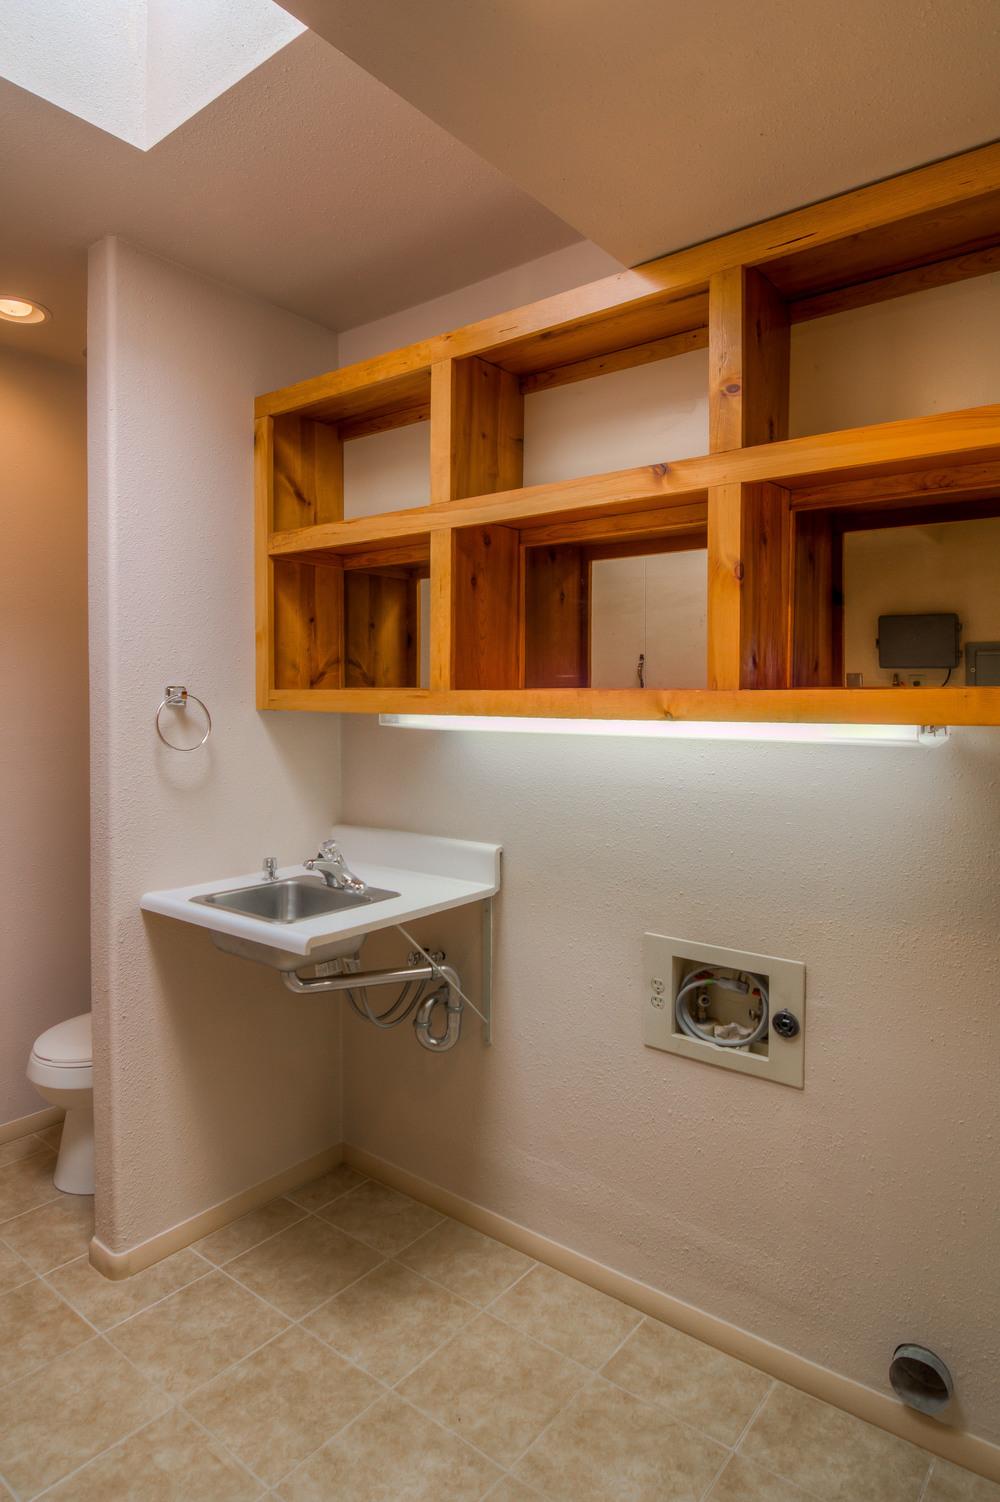 14 Laudnry Room.jpg